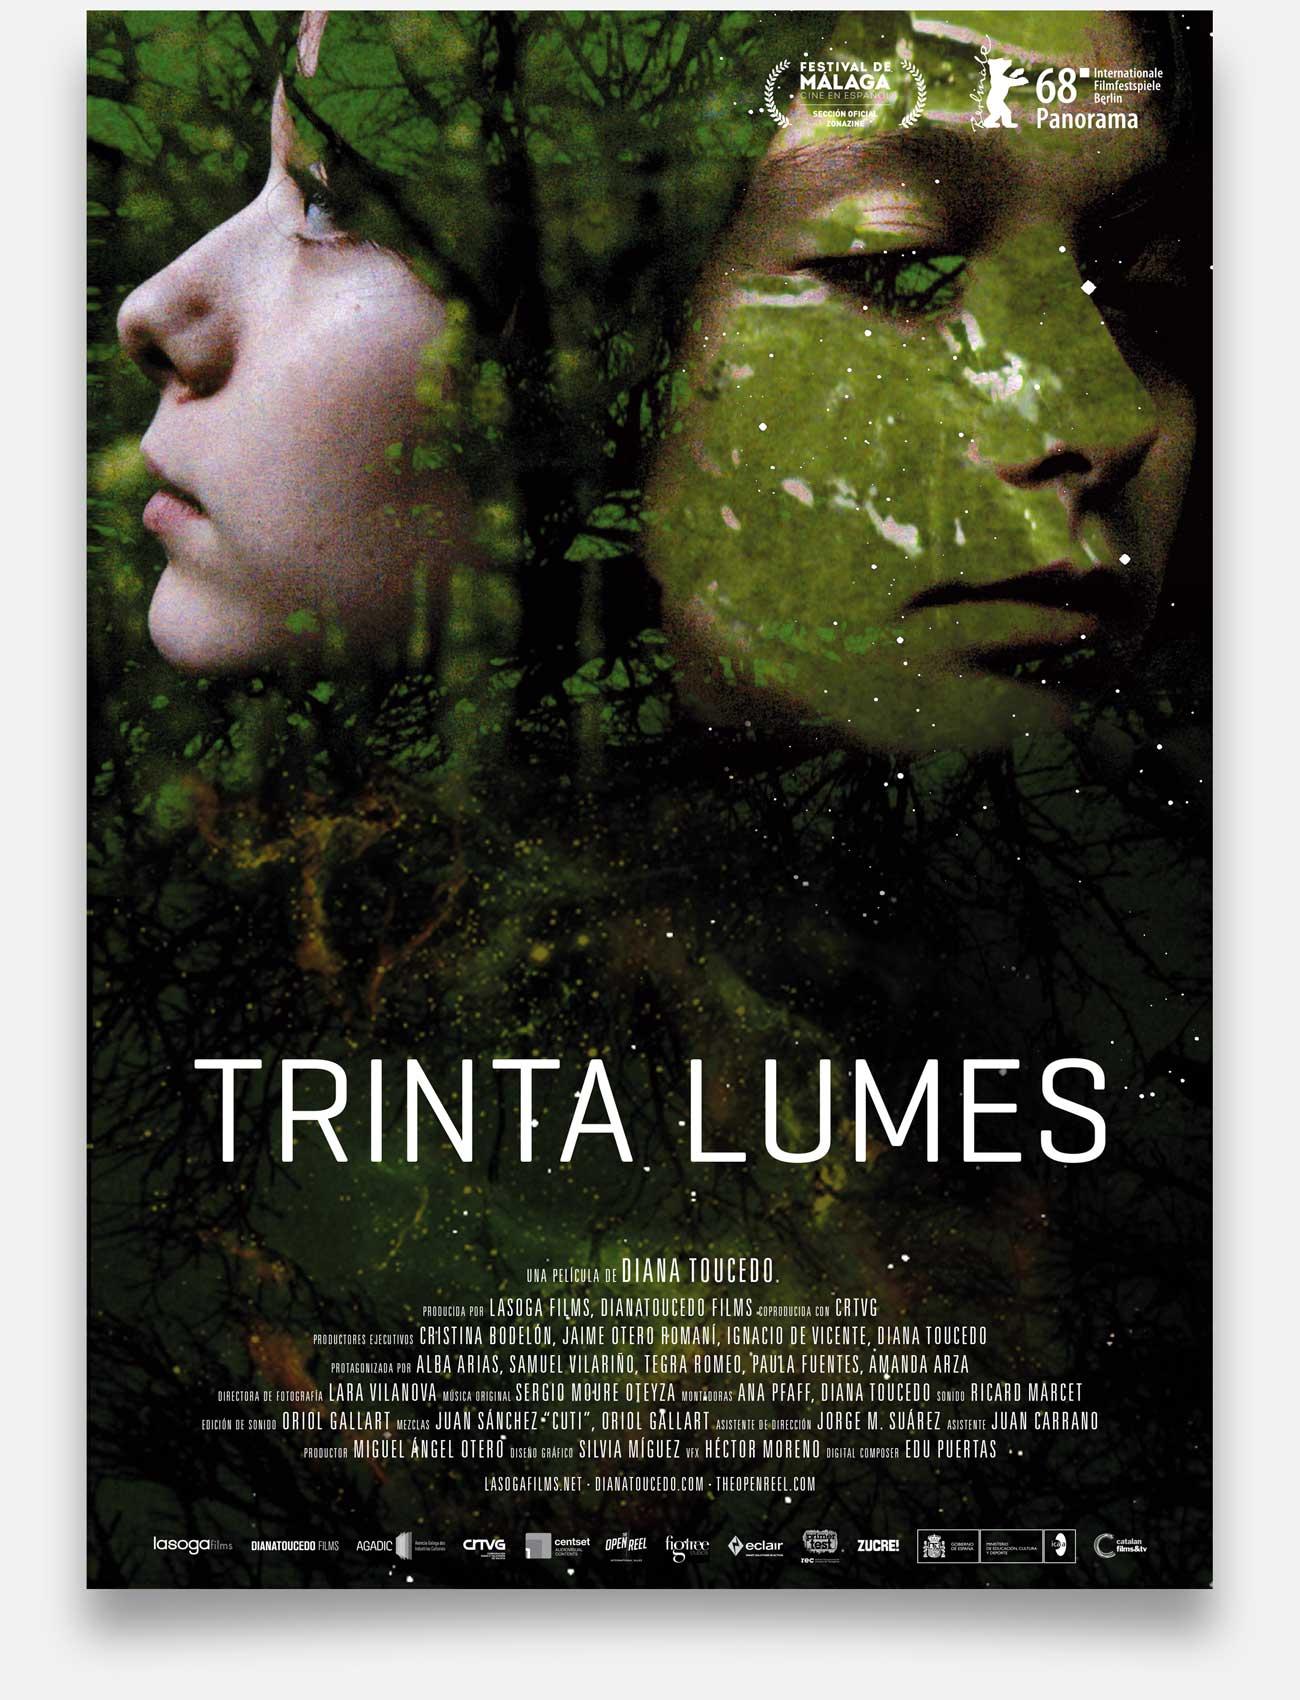 Silvia Miguez-Poster-Movie-Thirty Souls / Trinta Lumes